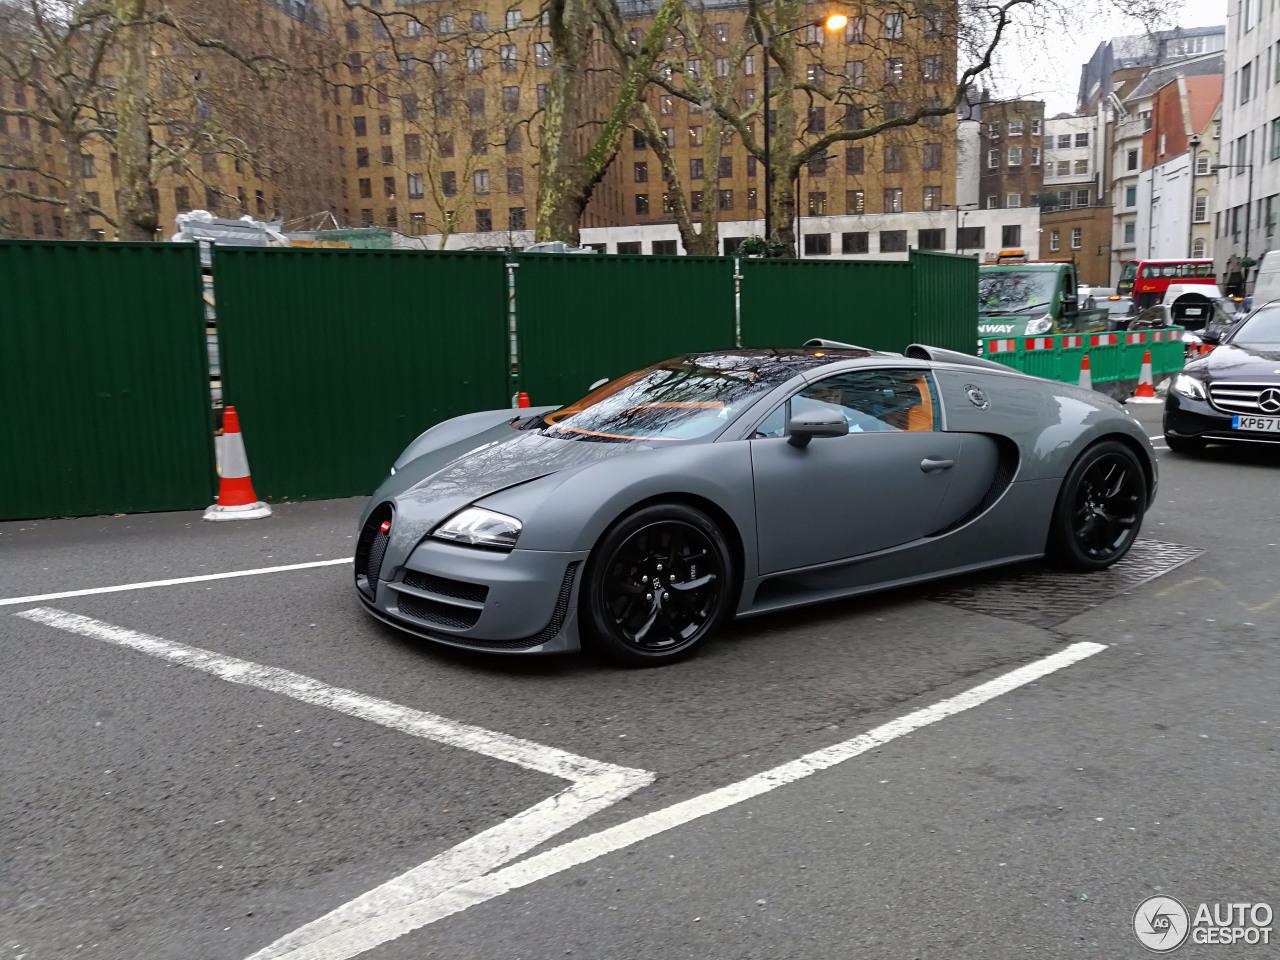 Bugatti Veyron 16.4 Grand Sport Vitesse - 17 January 2018 ...